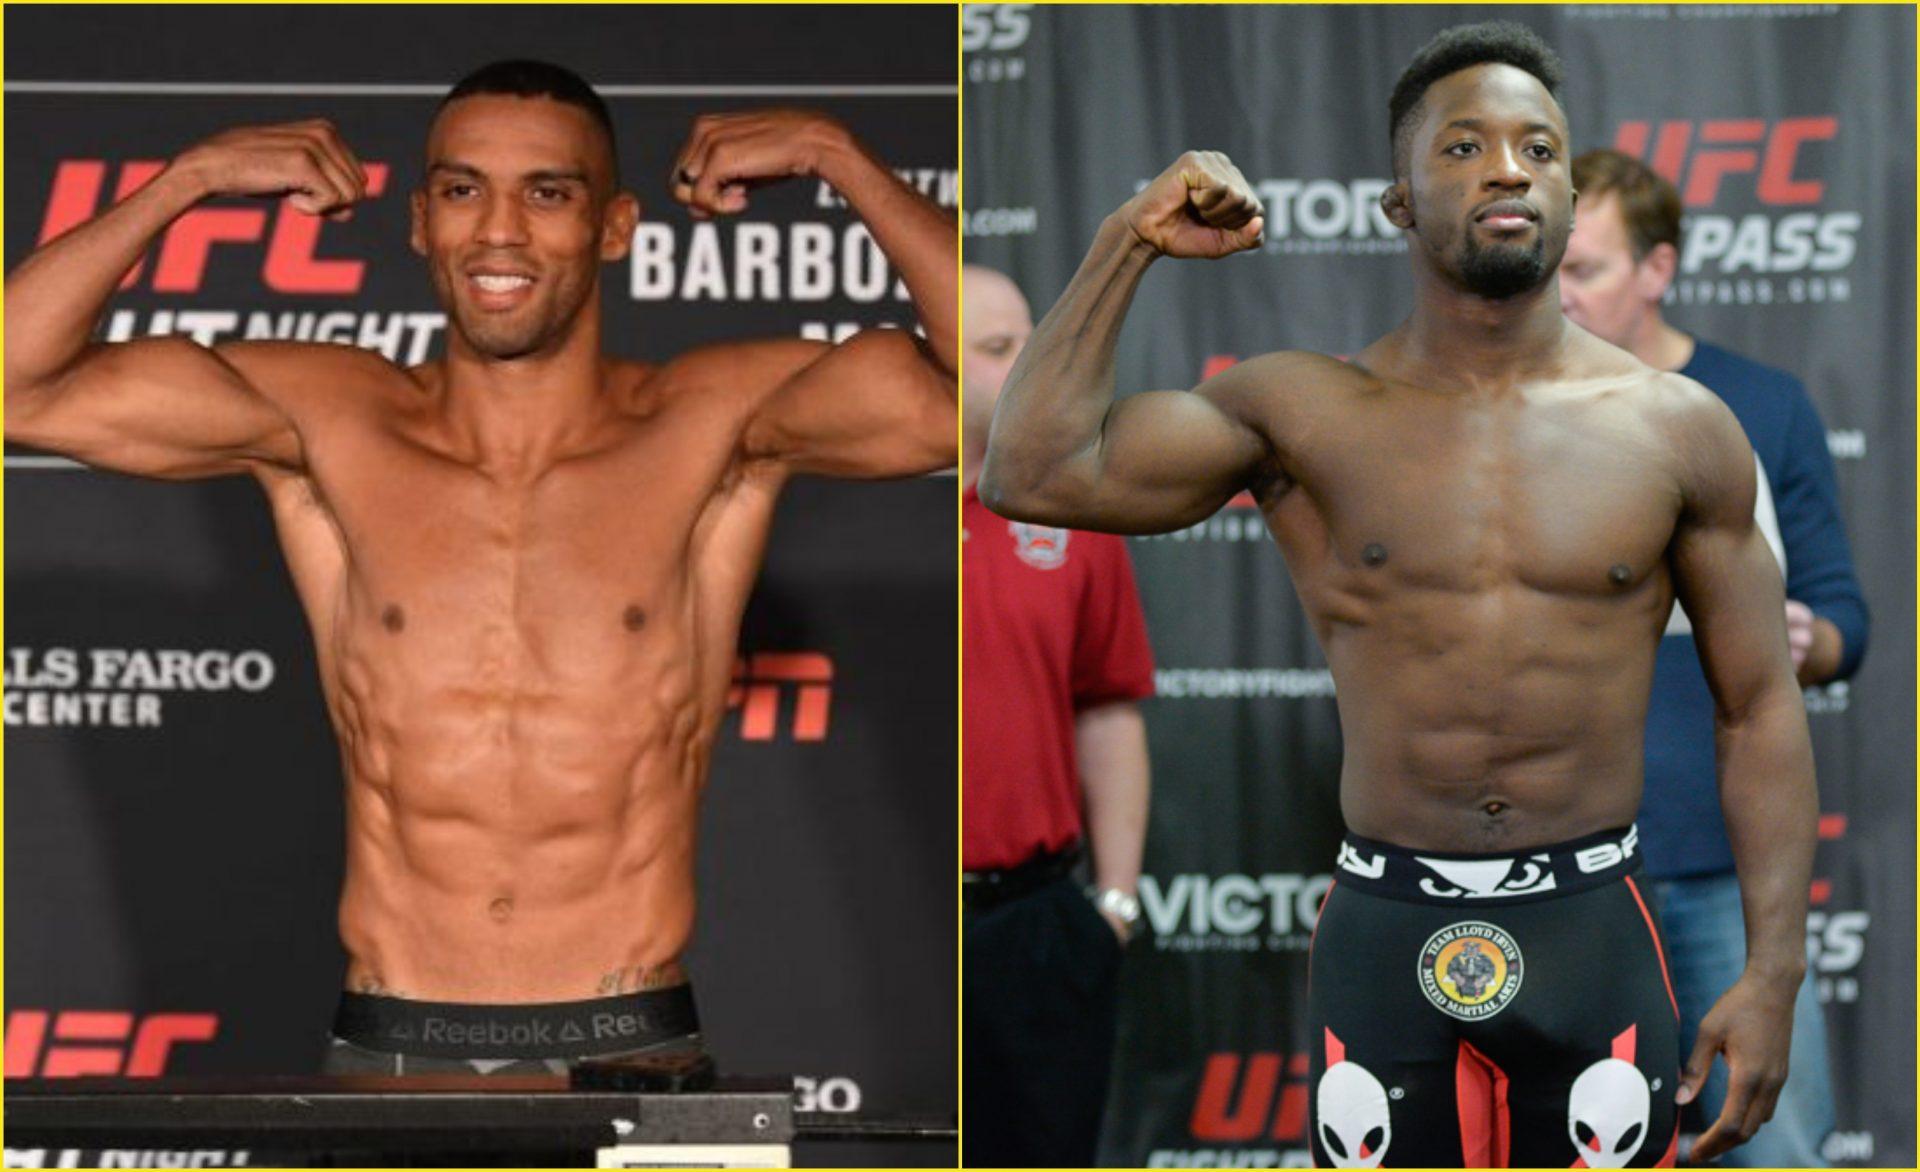 Edson Barboza vs Sodiq Yusuff set for Oct 10 UFC event - Barboza